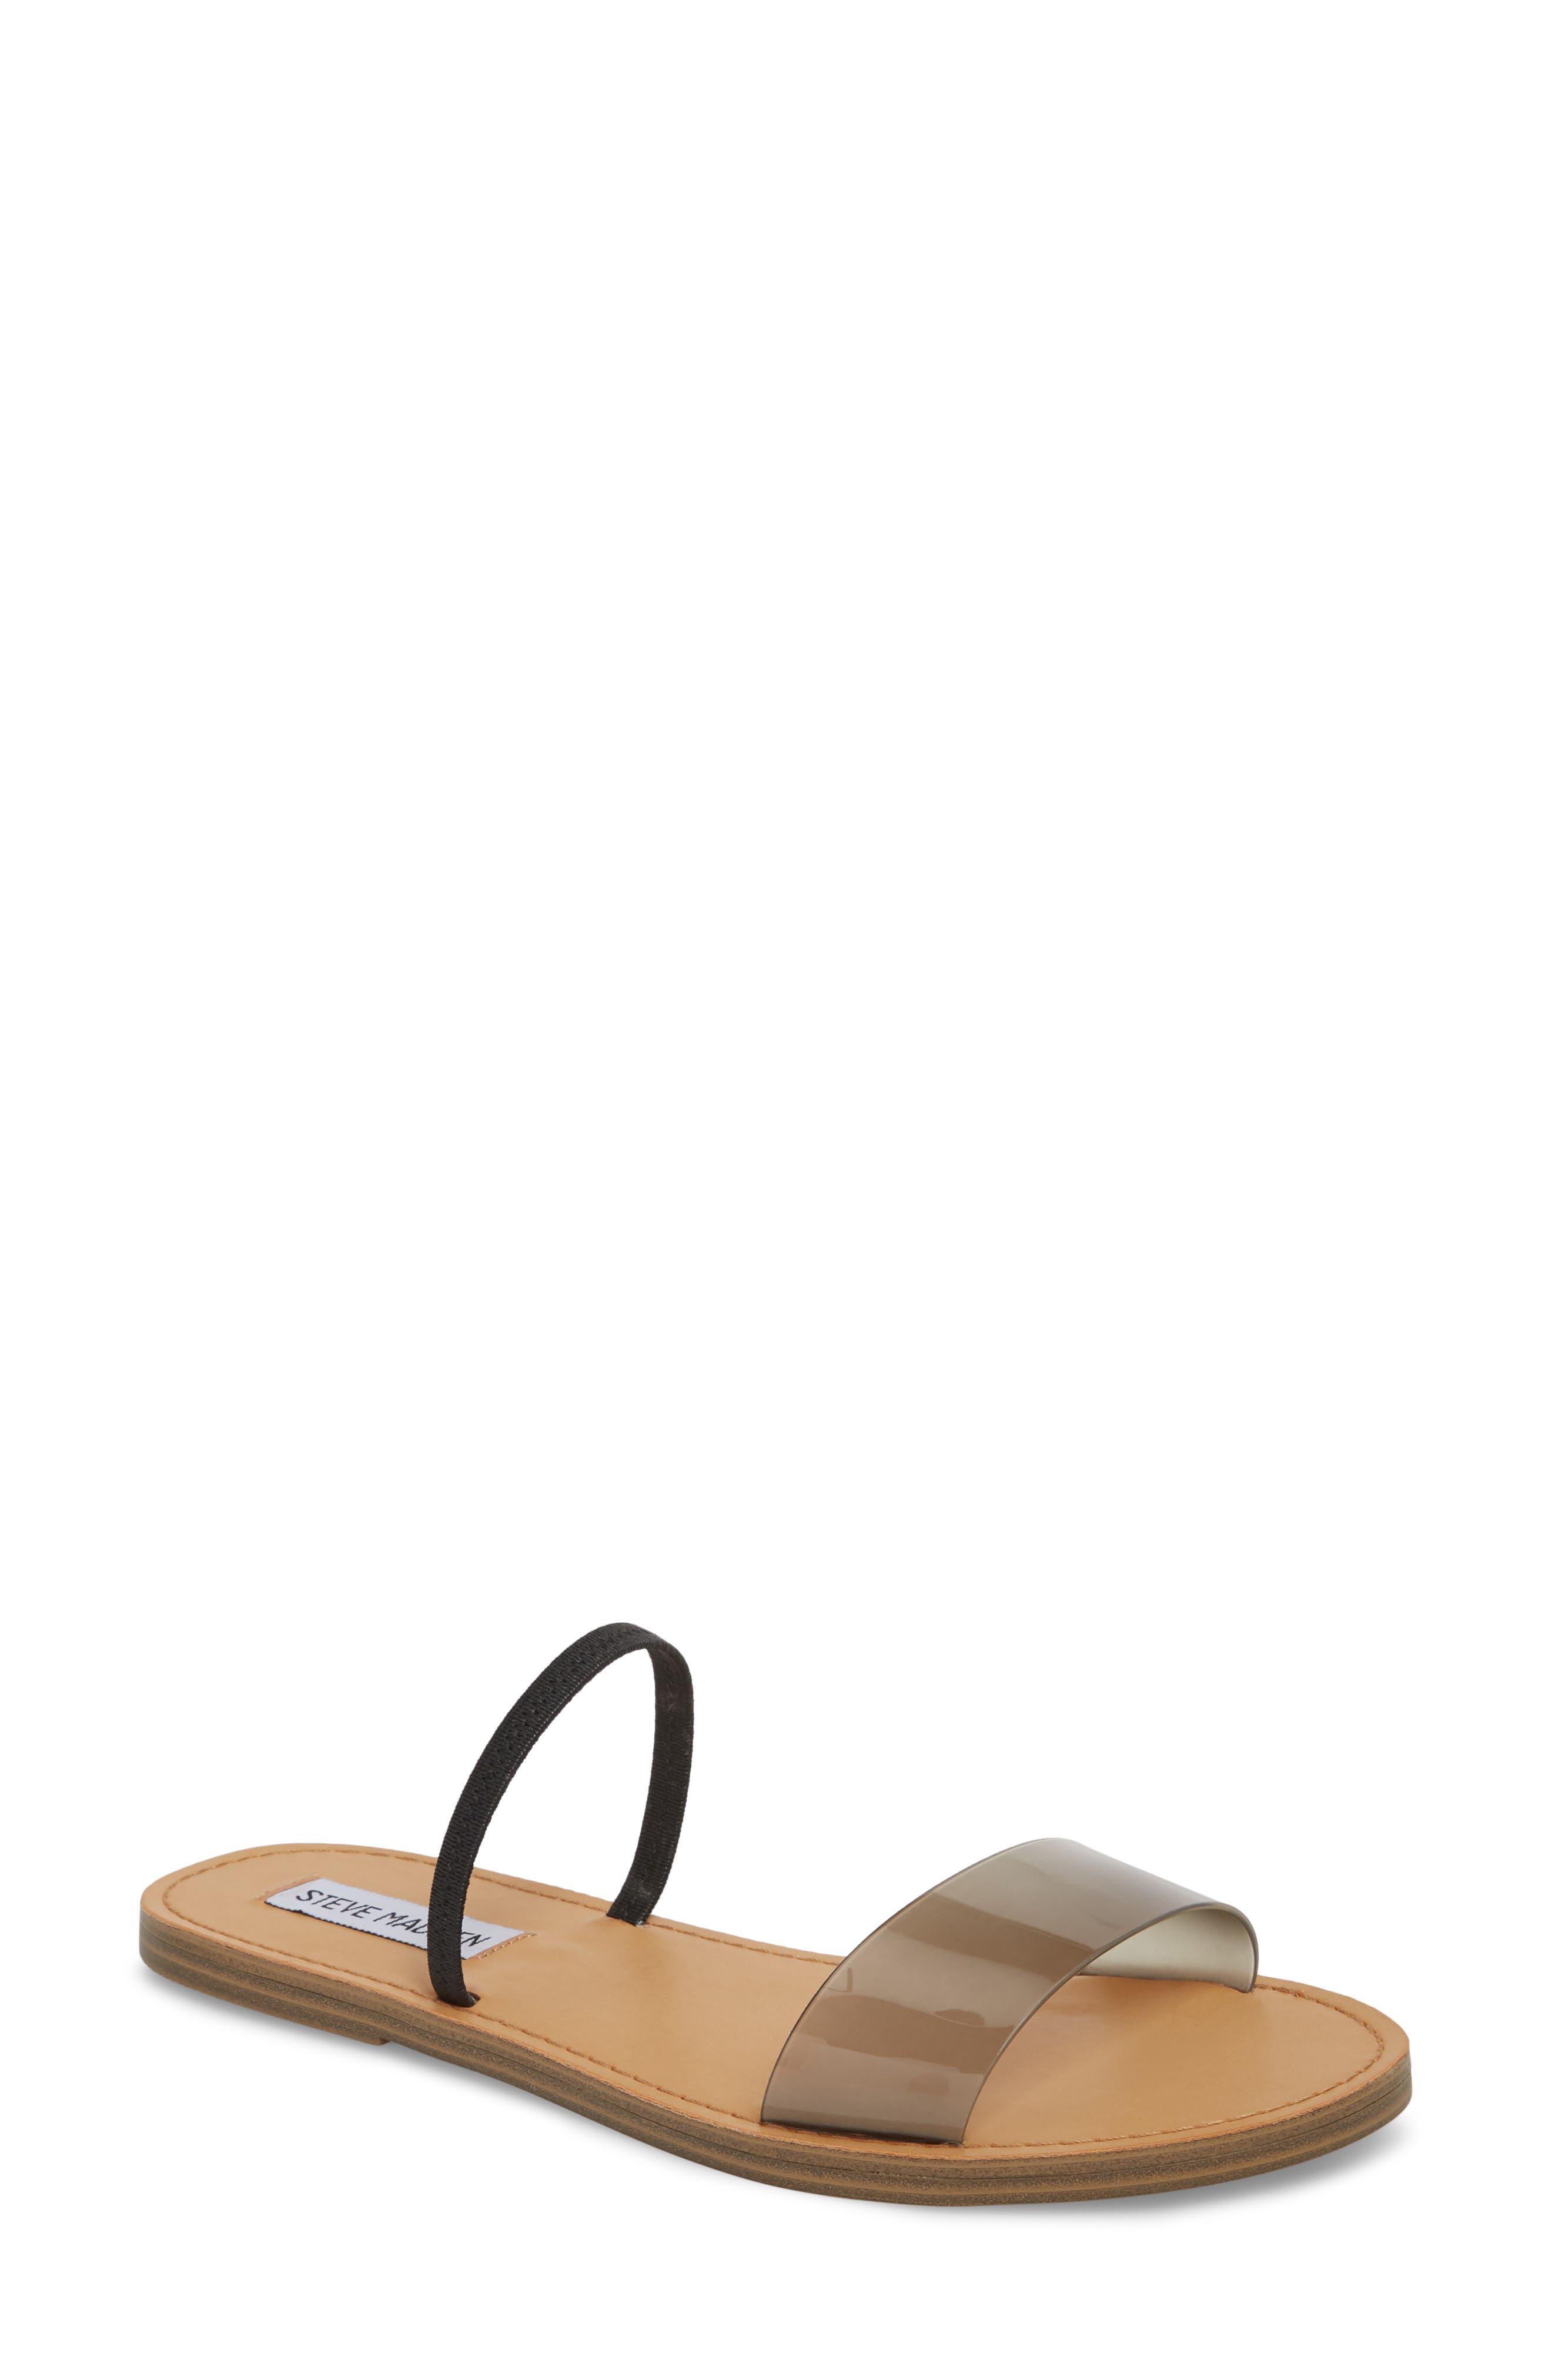 Dasha Strappy Slide Sandal,                         Main,                         color, Smoke